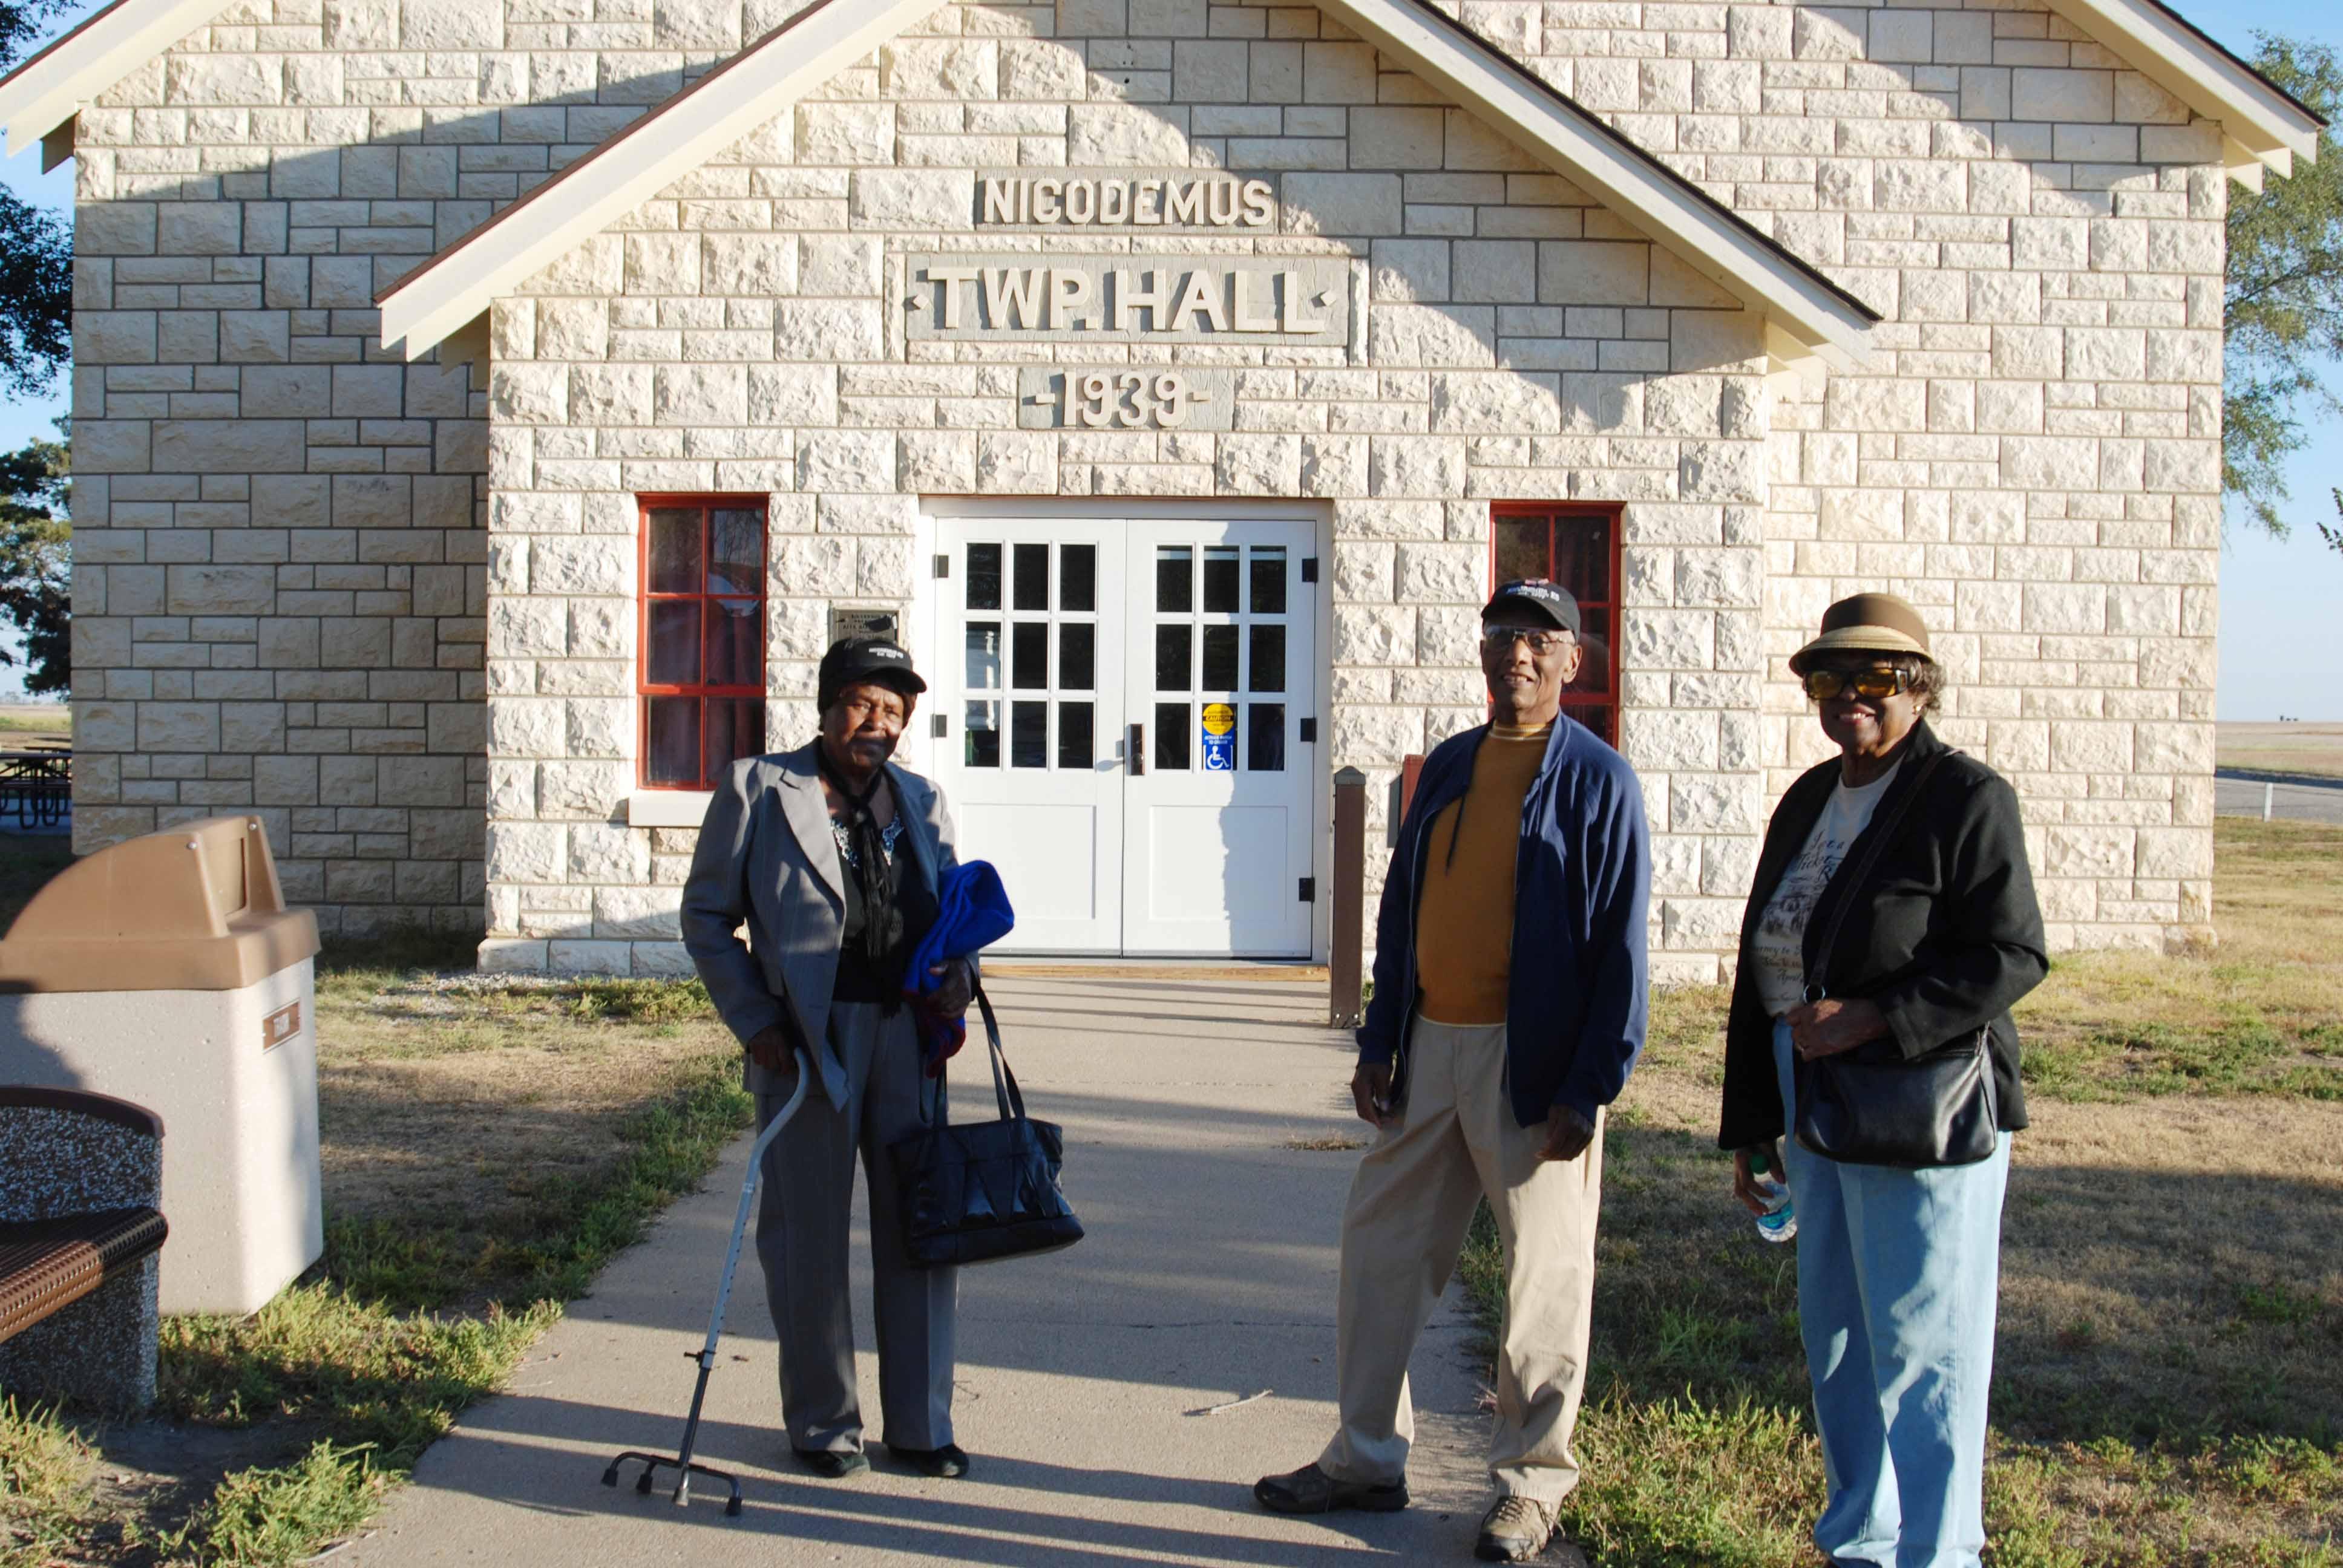 Descendants of Nicodemus, Kansas